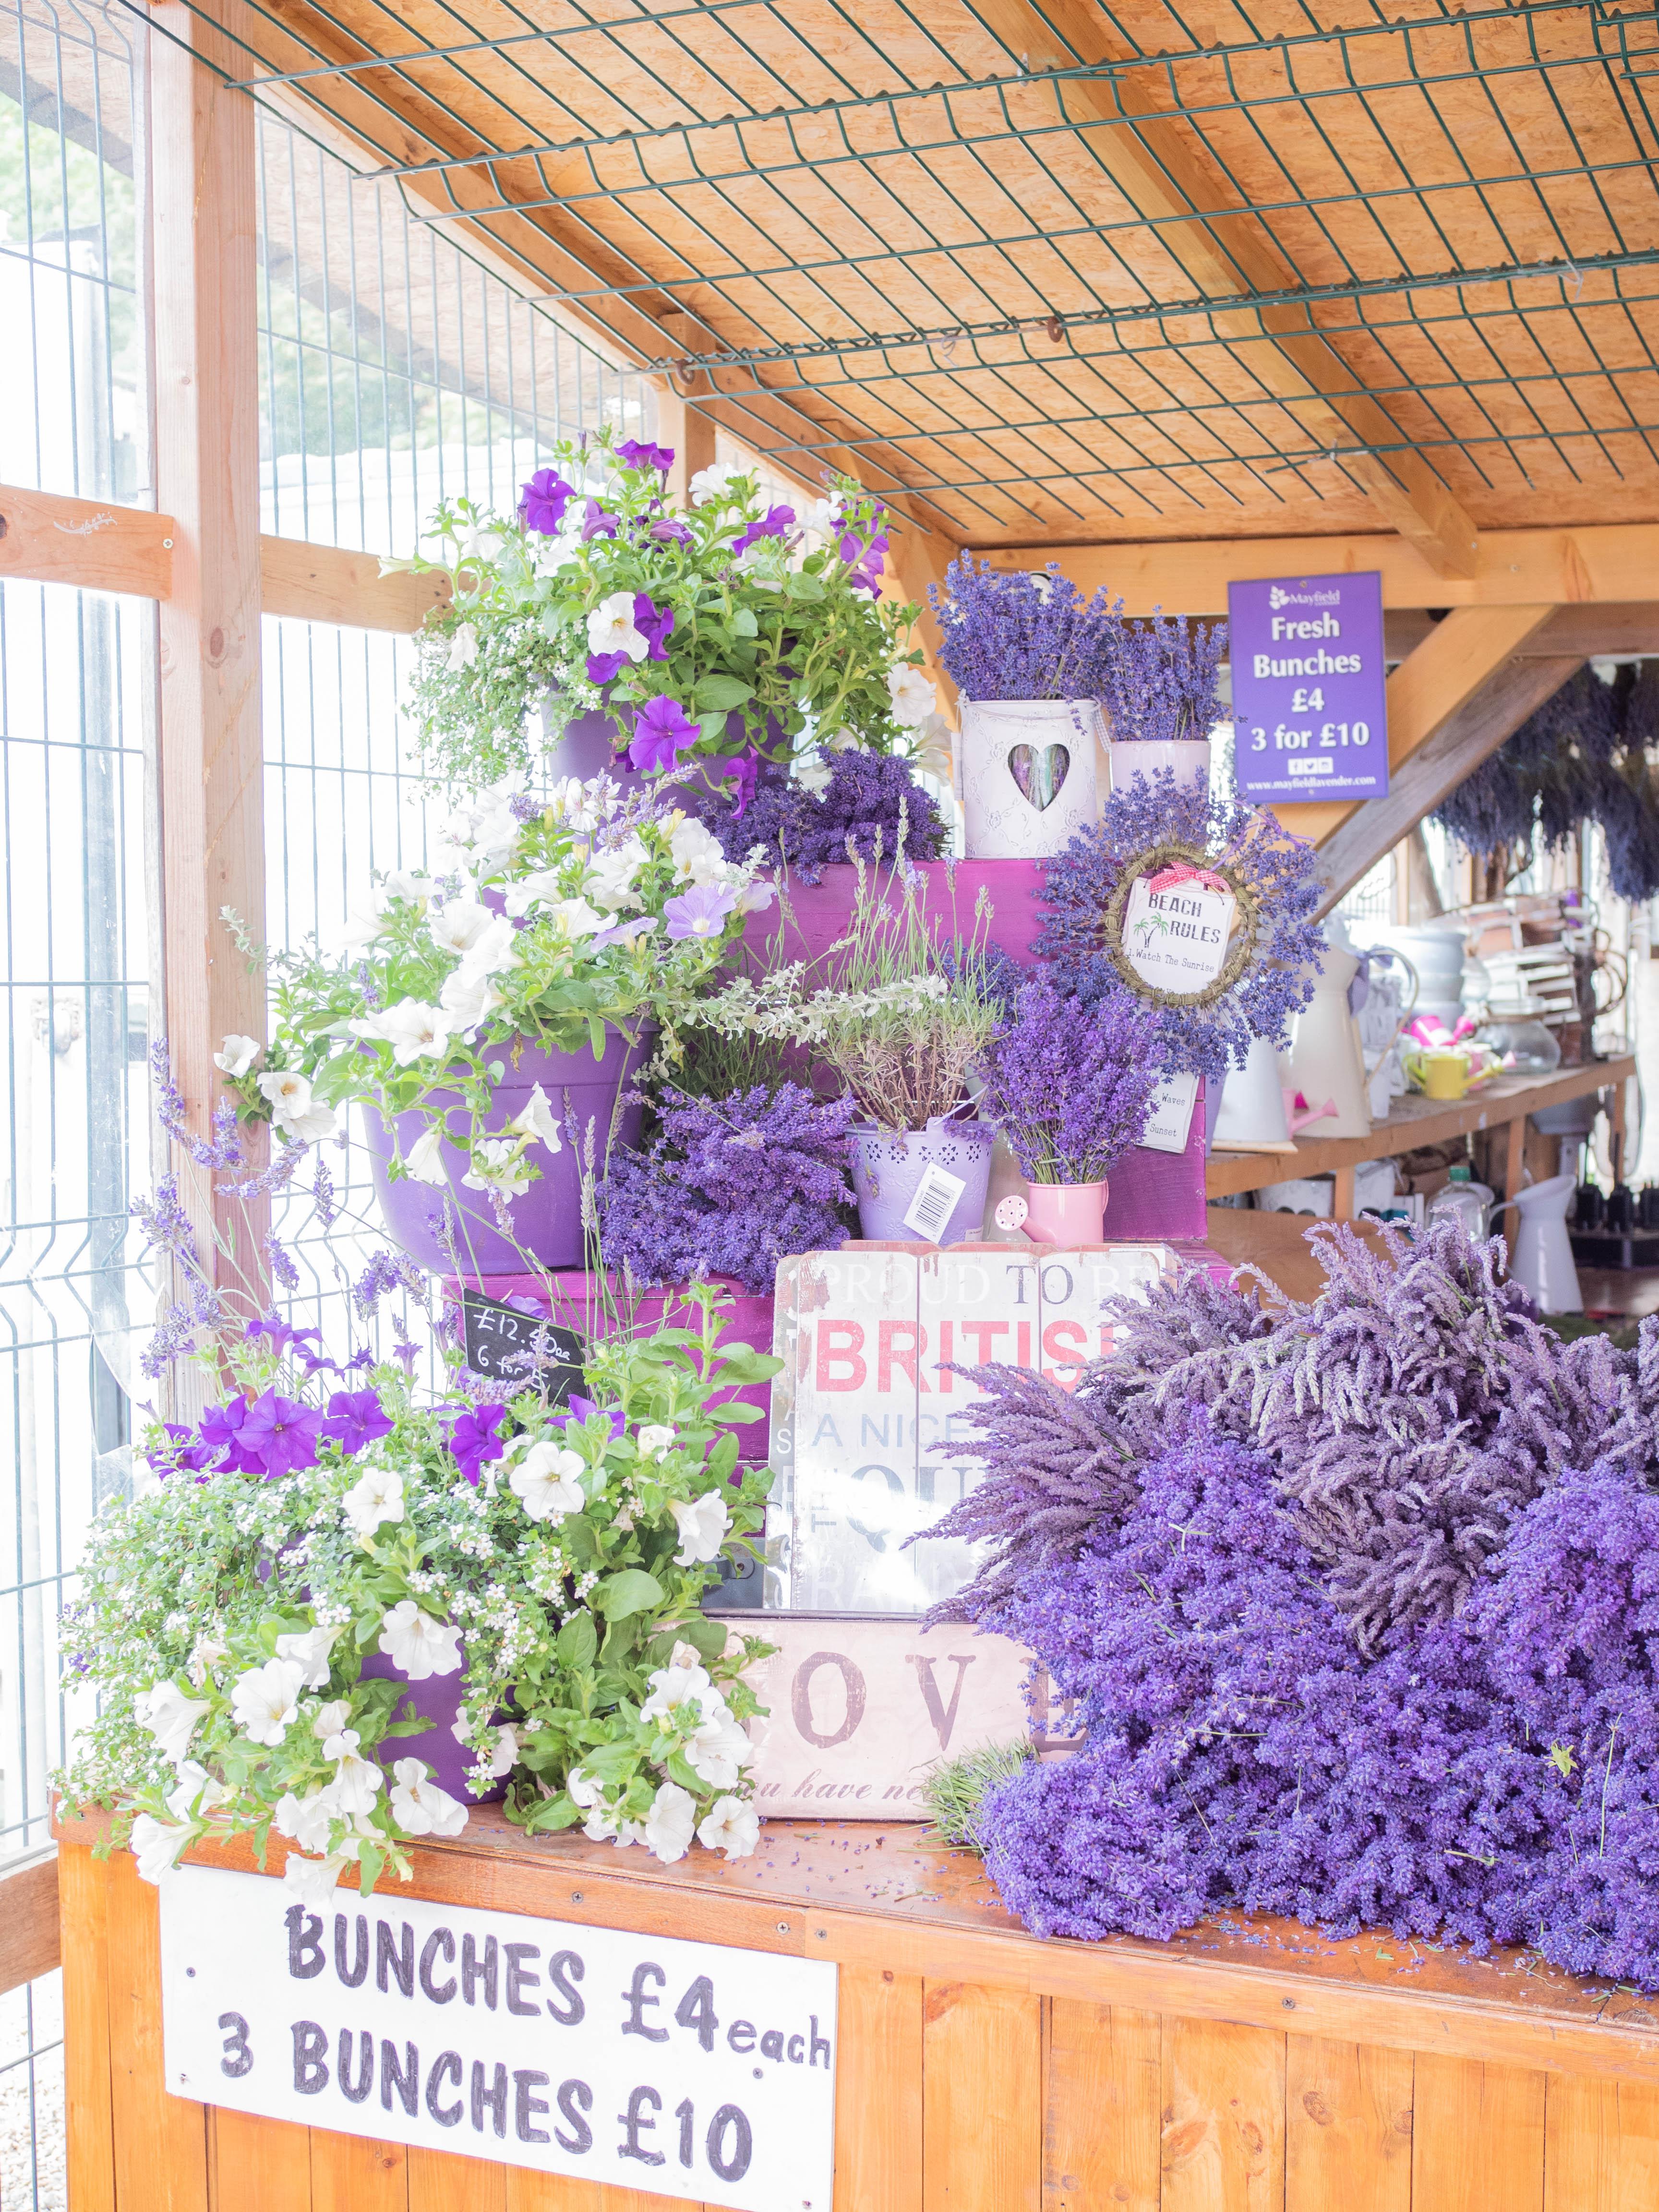 Bundles of lavender on display at Mayfield Lavender Farm